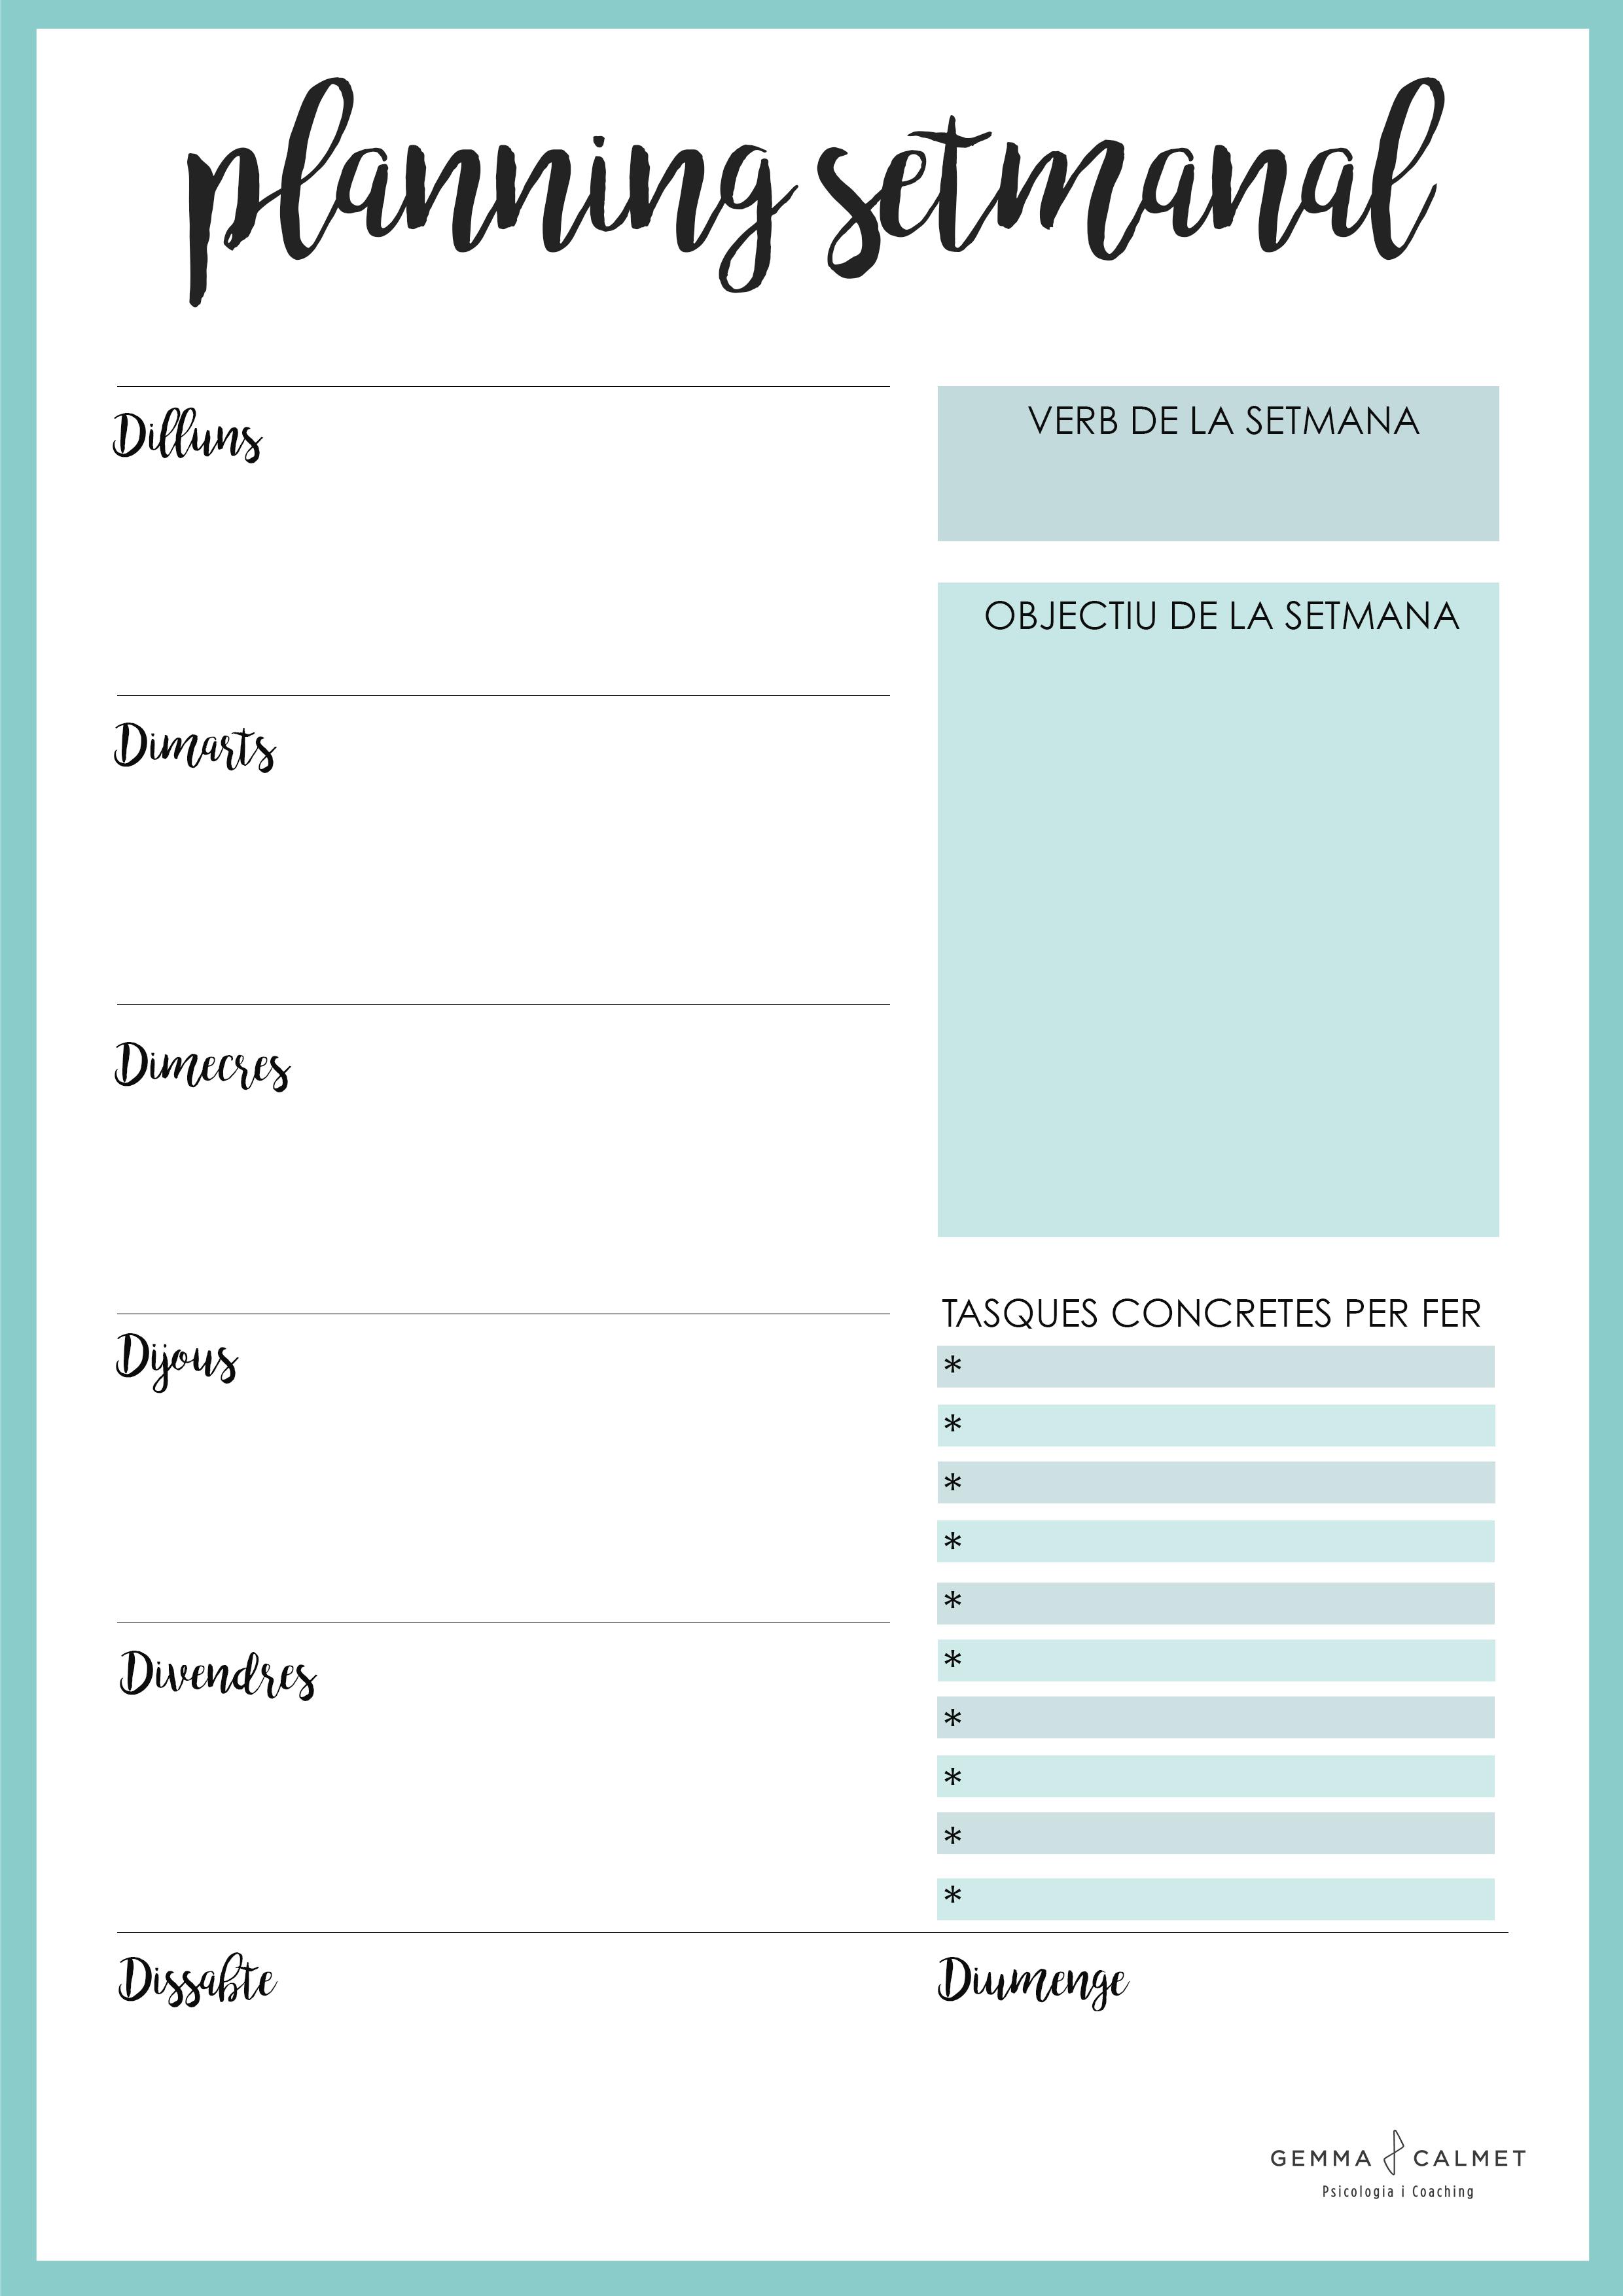 model planning setmanal